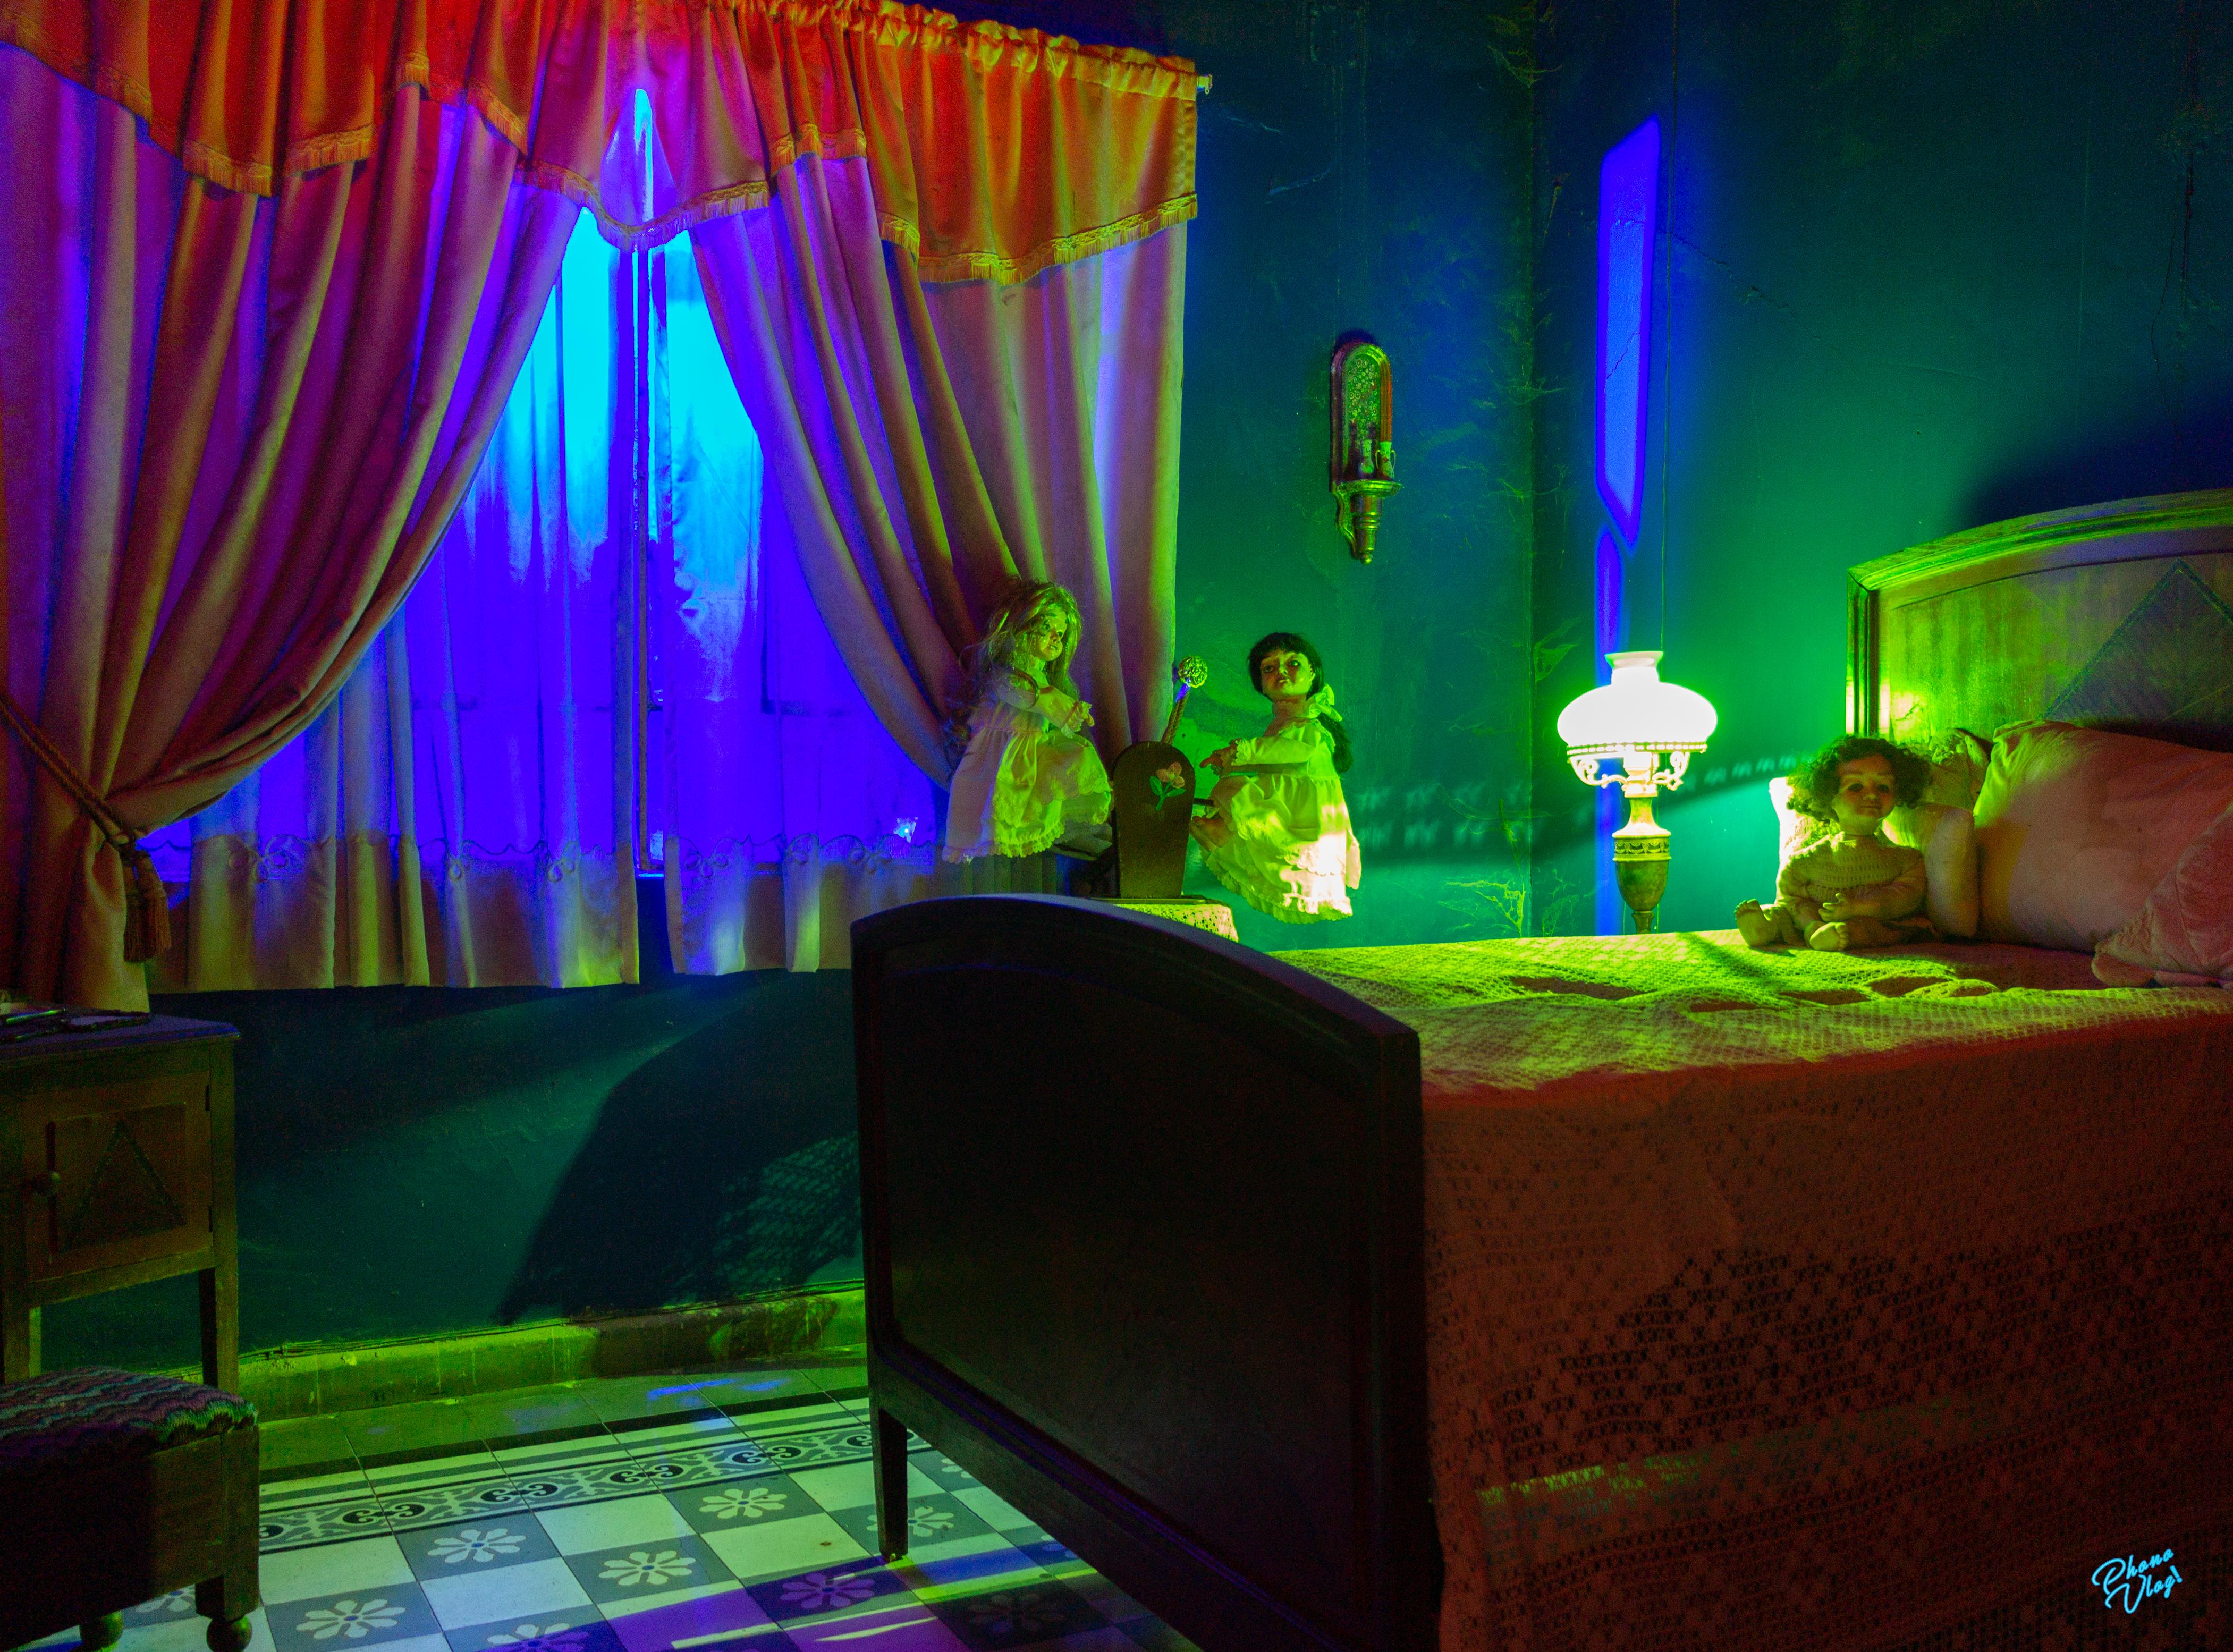 Casa de Tía Aura: el escalofriante museo de Guanajuato capital ¿Te atreves o te da miedo? 😱 😨